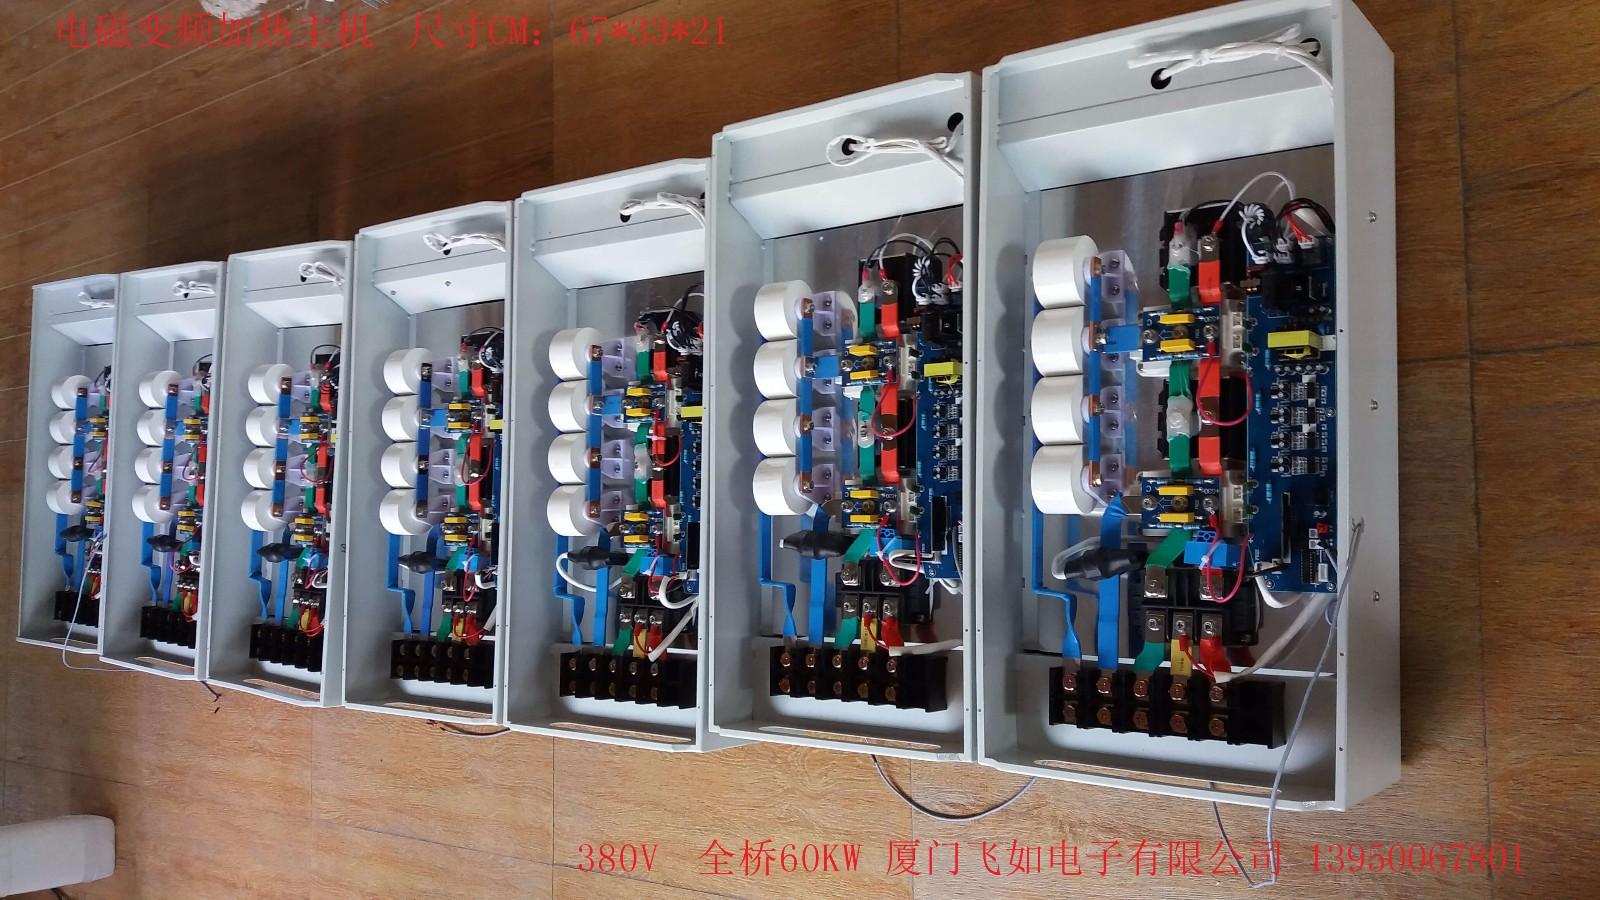 380V 60KW电磁加热主机